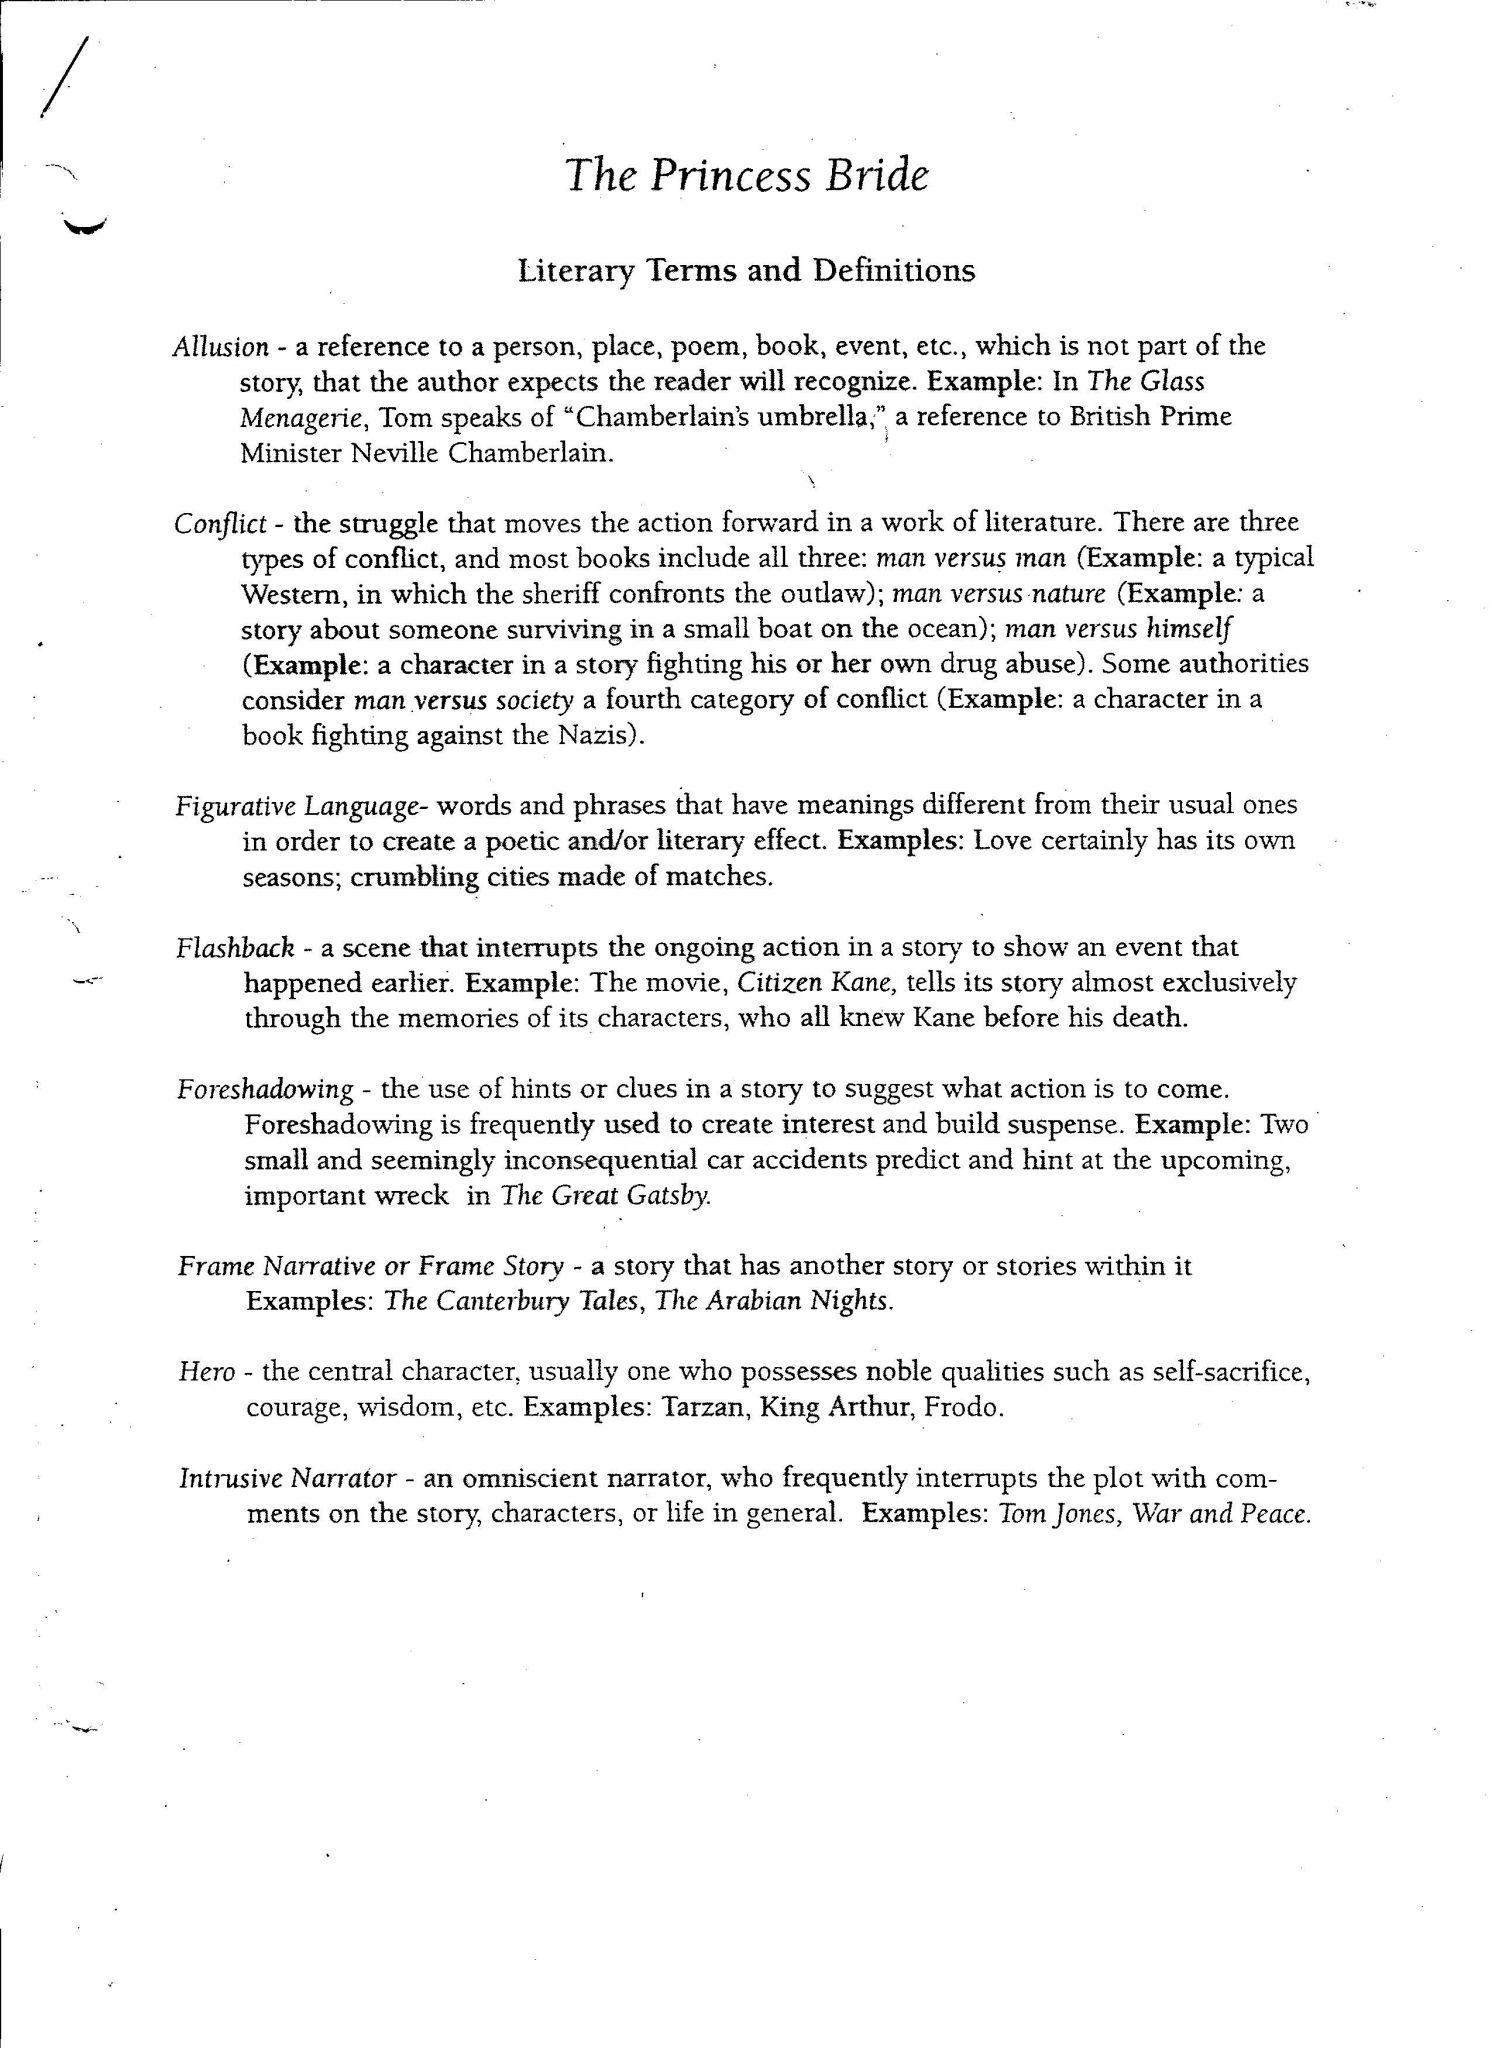 Canterbury Tales Prologue Worksheet Answers